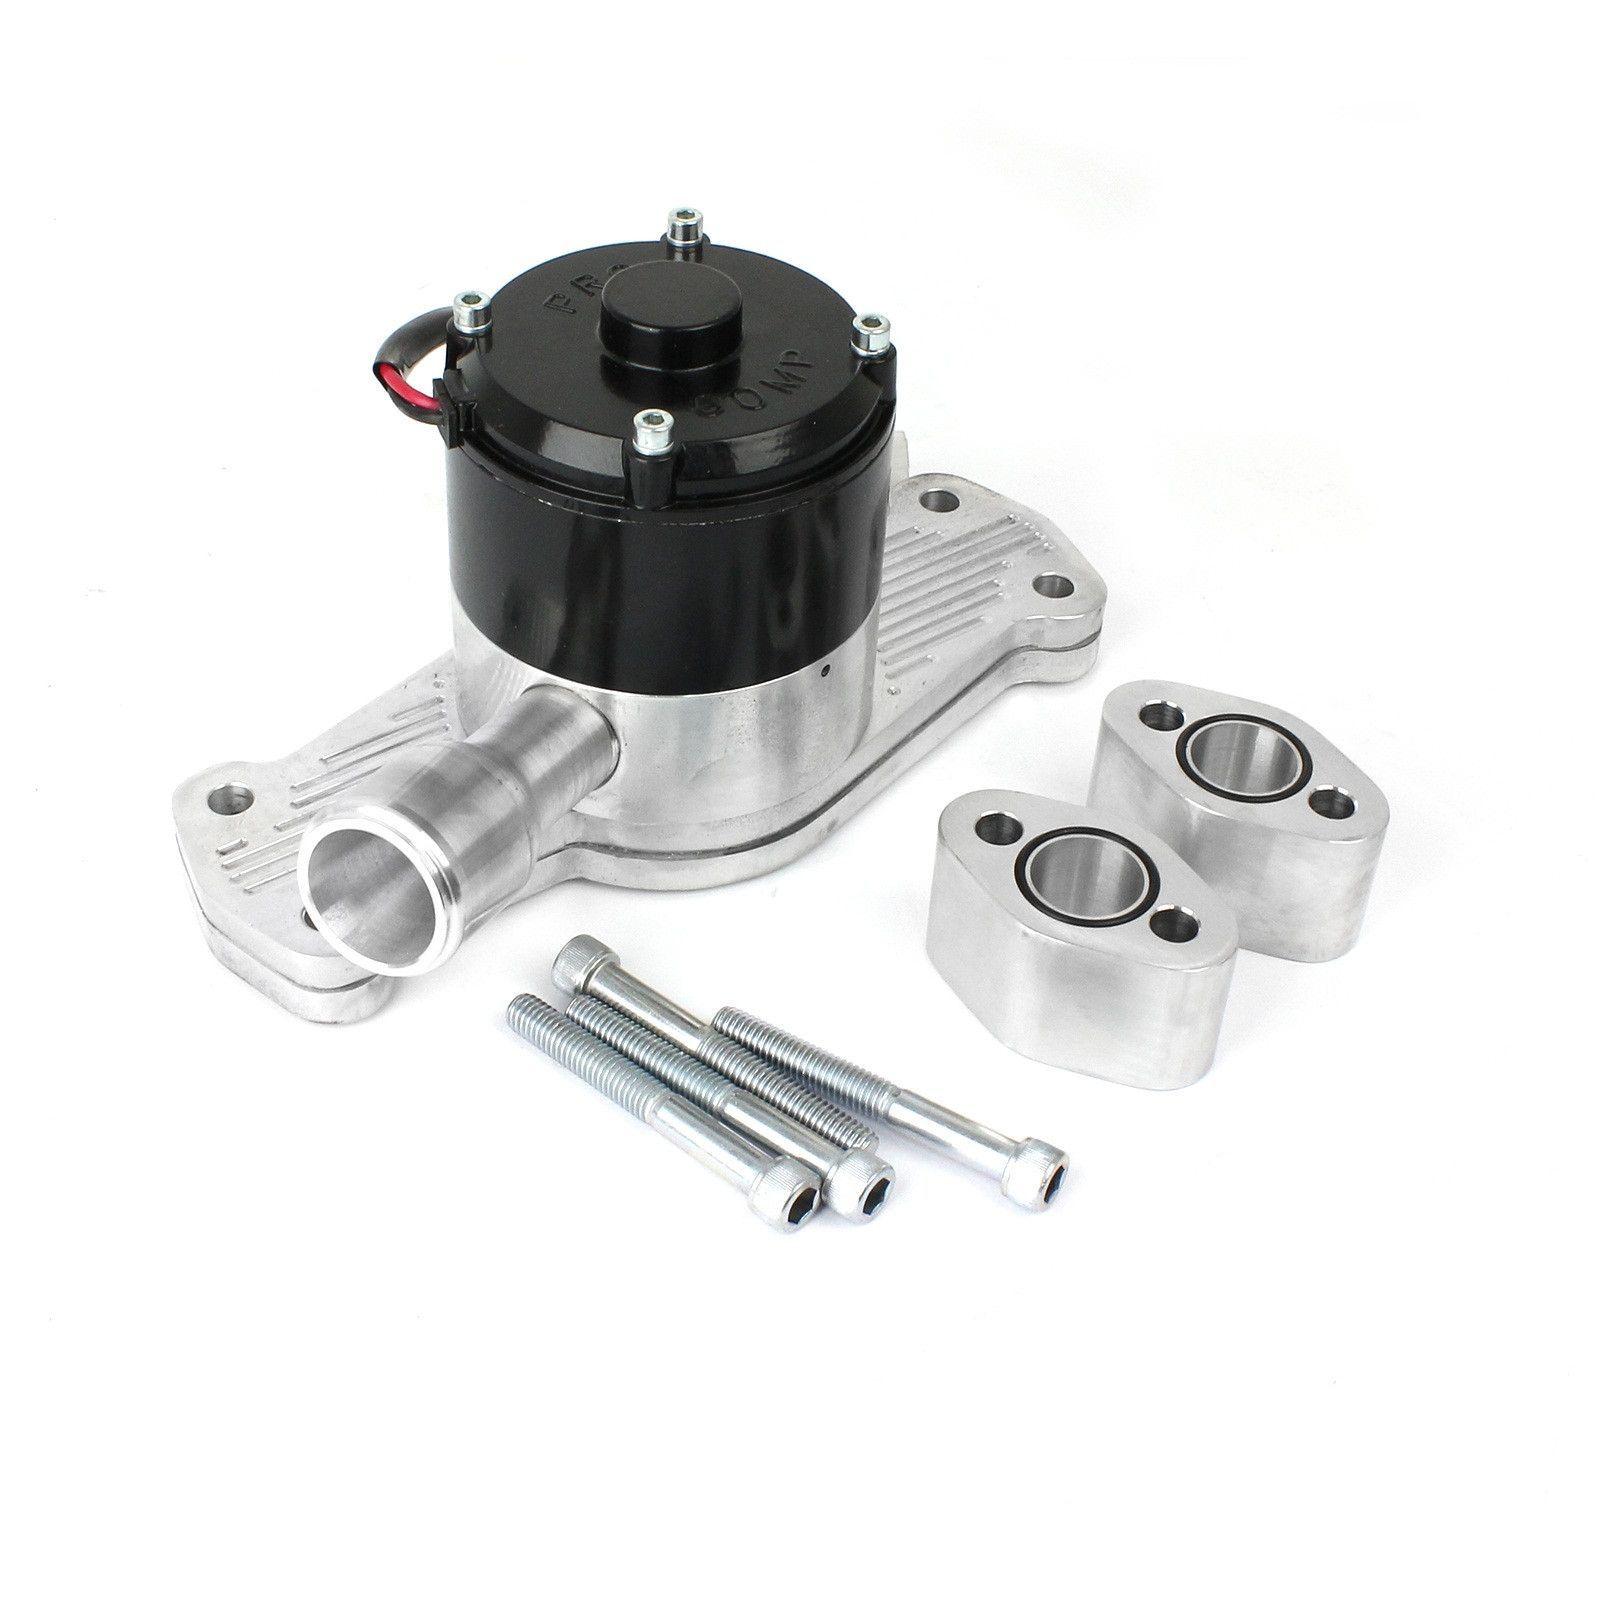 medium resolution of chevy sbc 350 35 gpm slimline electric water pump polished